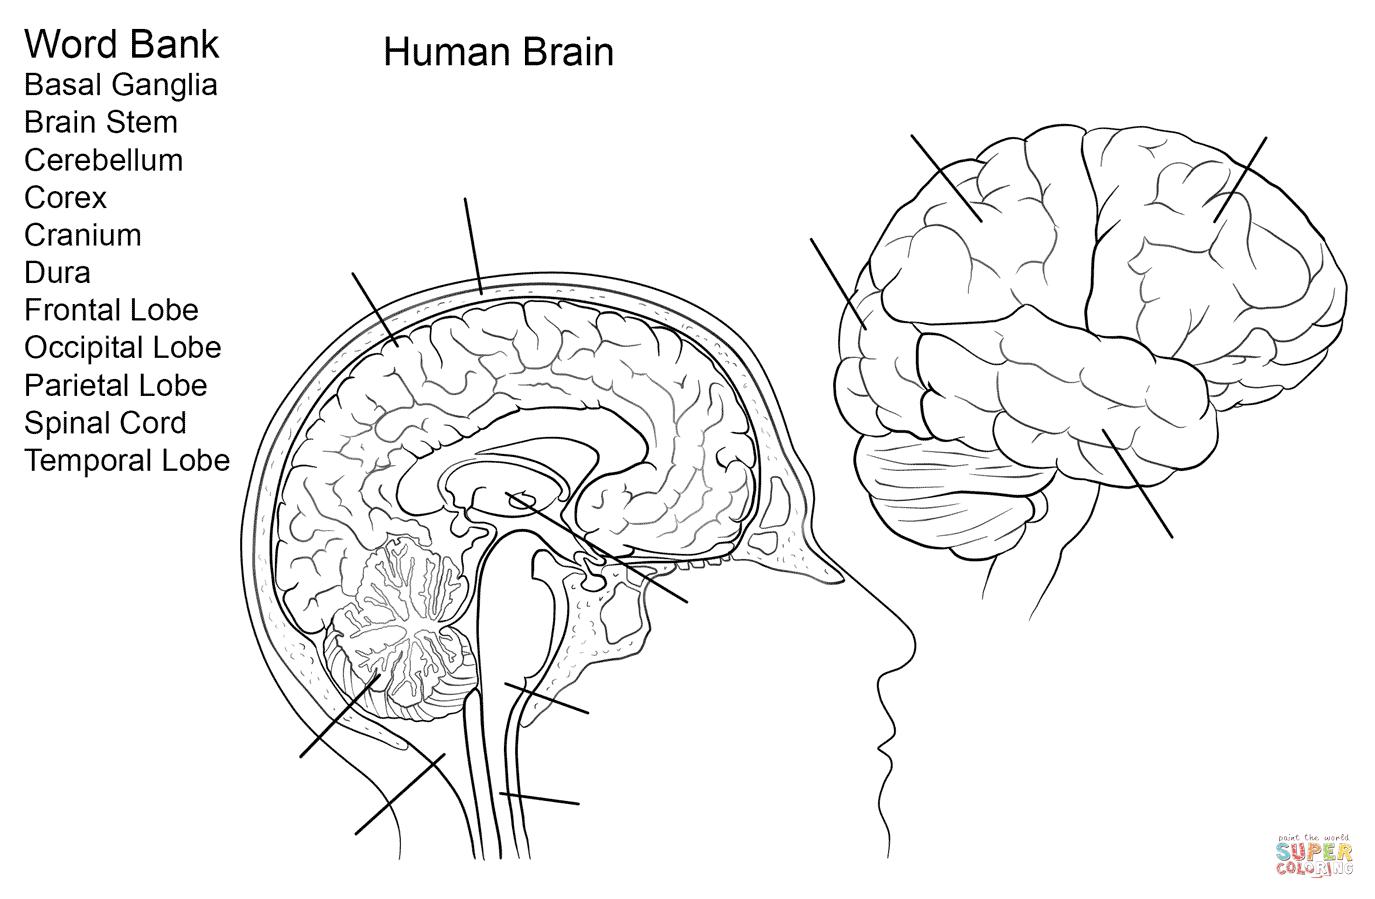 Human Brain Worksheet Coloring Page | Free Printable Coloring - Free Anatomy Coloring Pages Printable